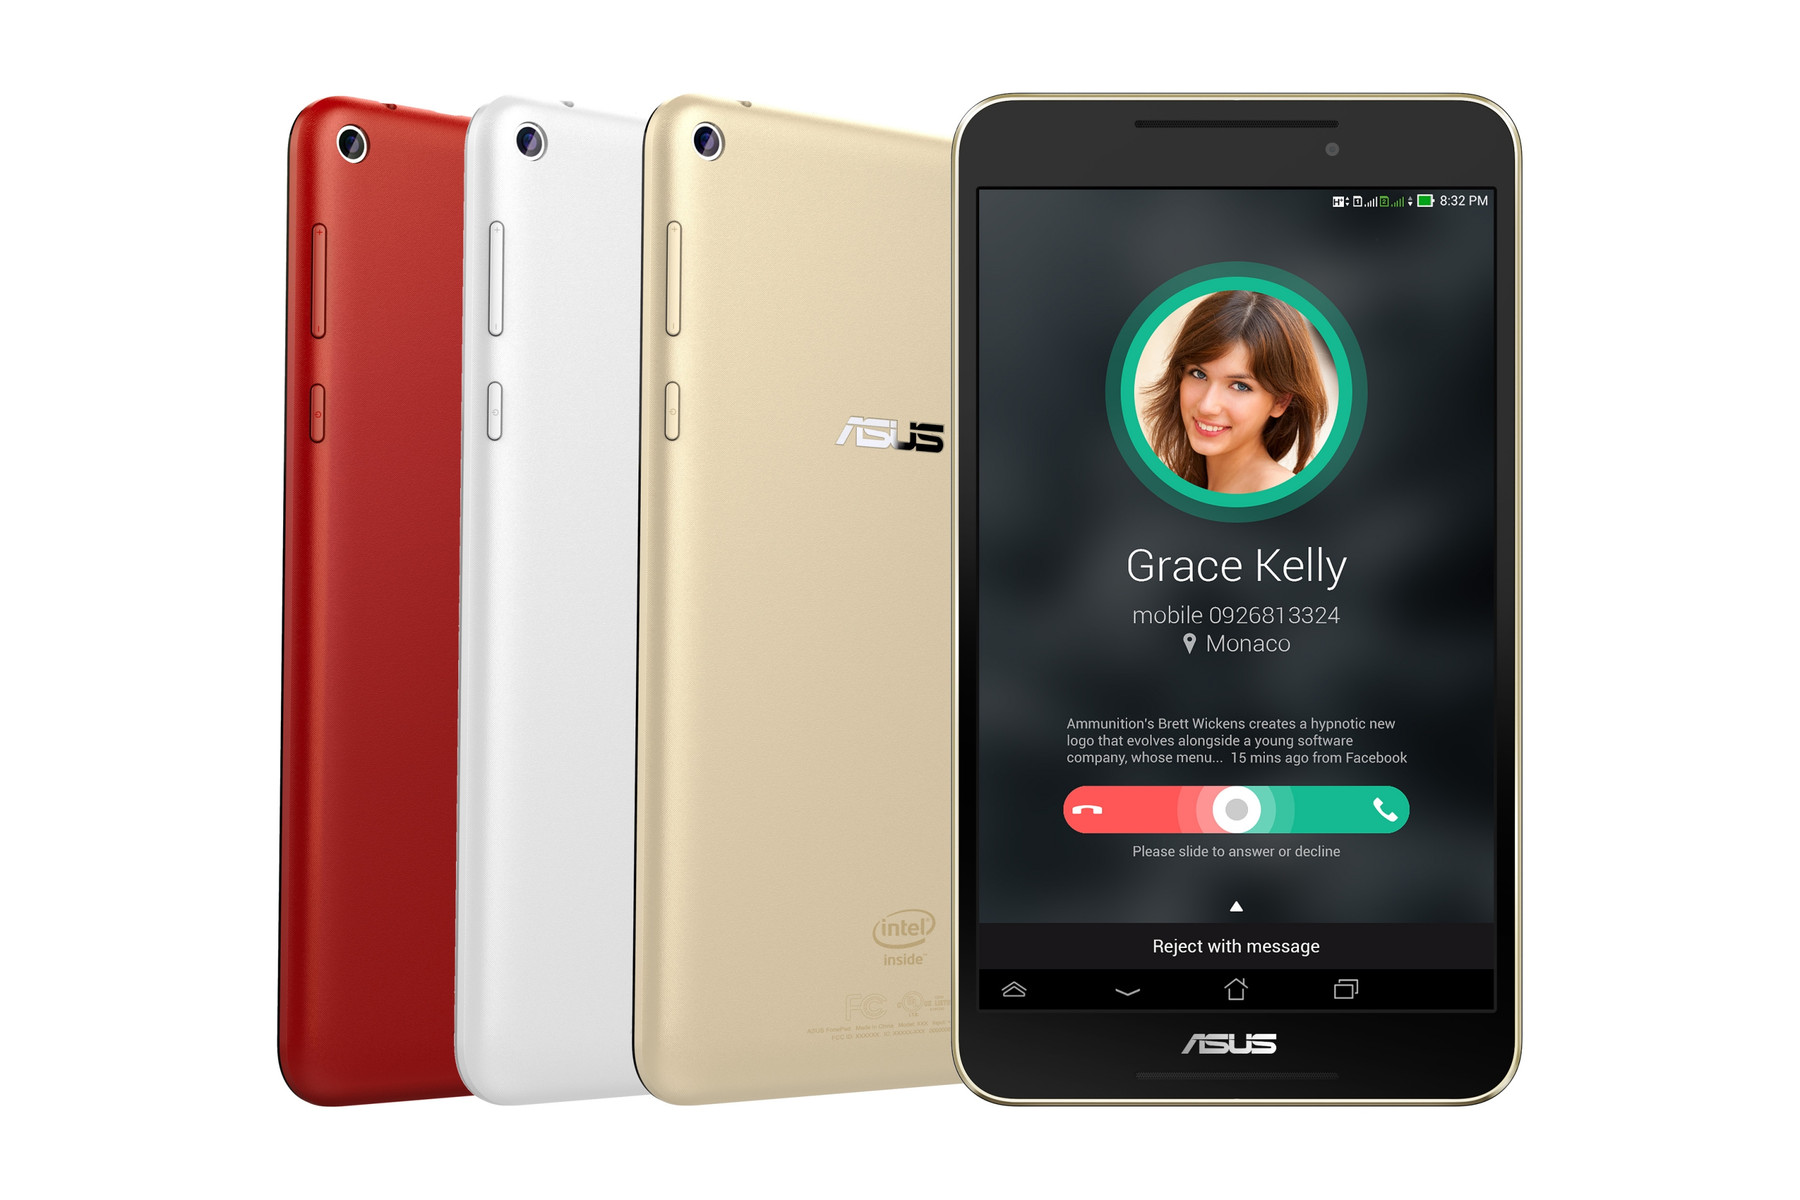 【ASUS福利品】Fonepad 8 8吋 WiFi 四核心 超輕薄 雙卡雙待可通話平板 FE380CG 1G/8G